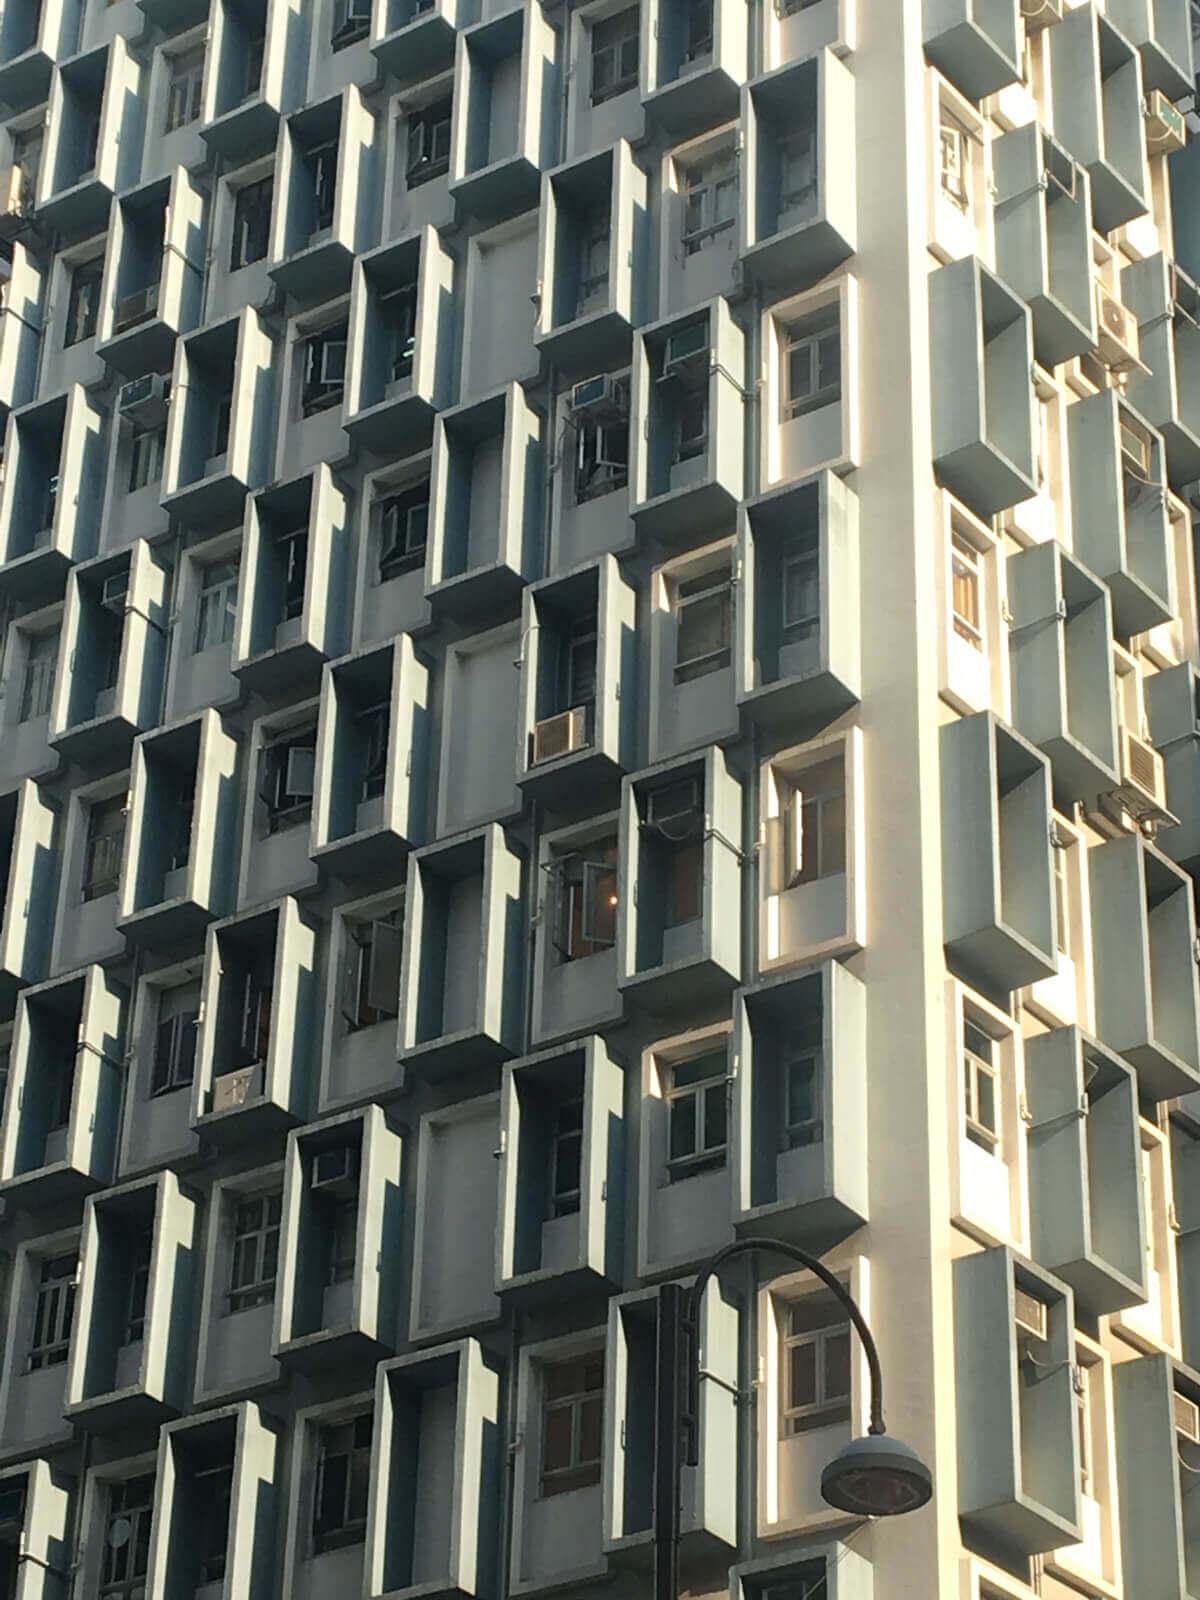 Caroline Tomlinson Hong Kong skyscraper detail